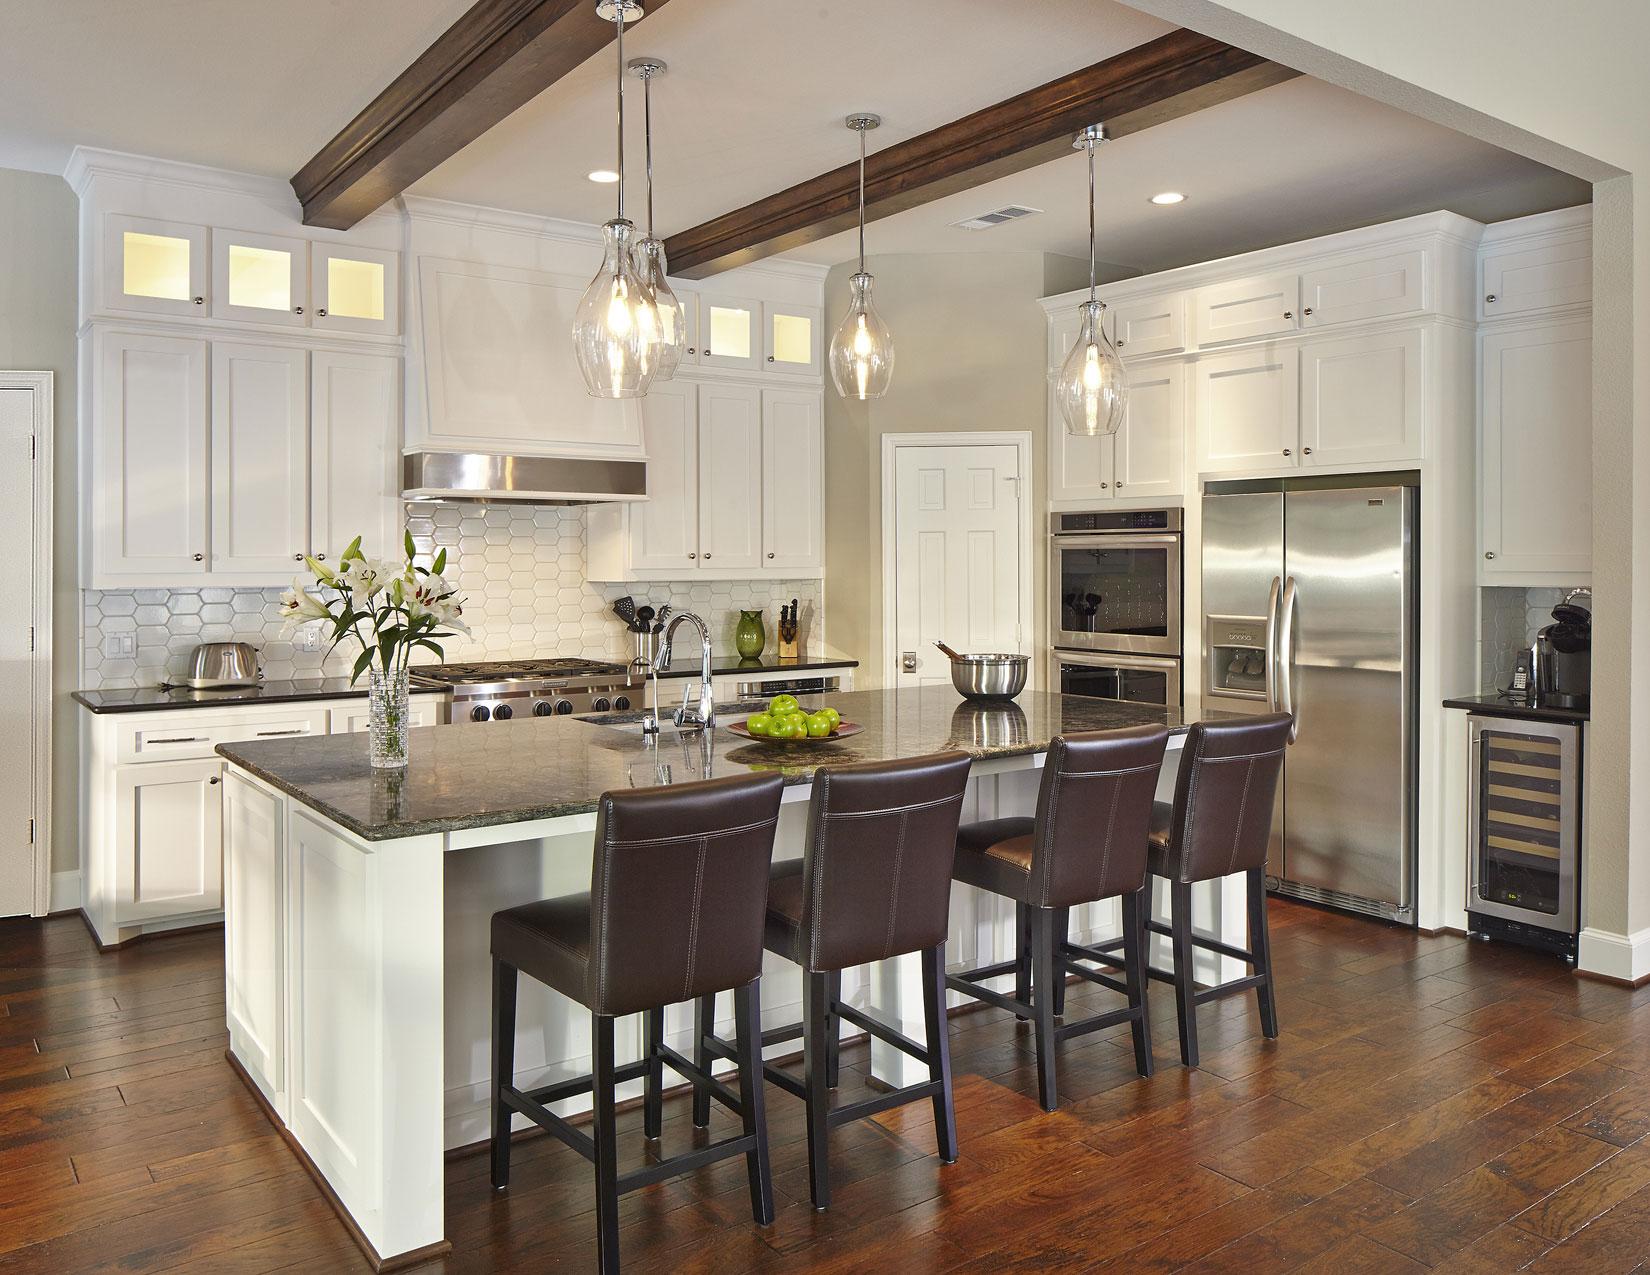 kitchen remodel dallas aid range hood remodeling design build contact us